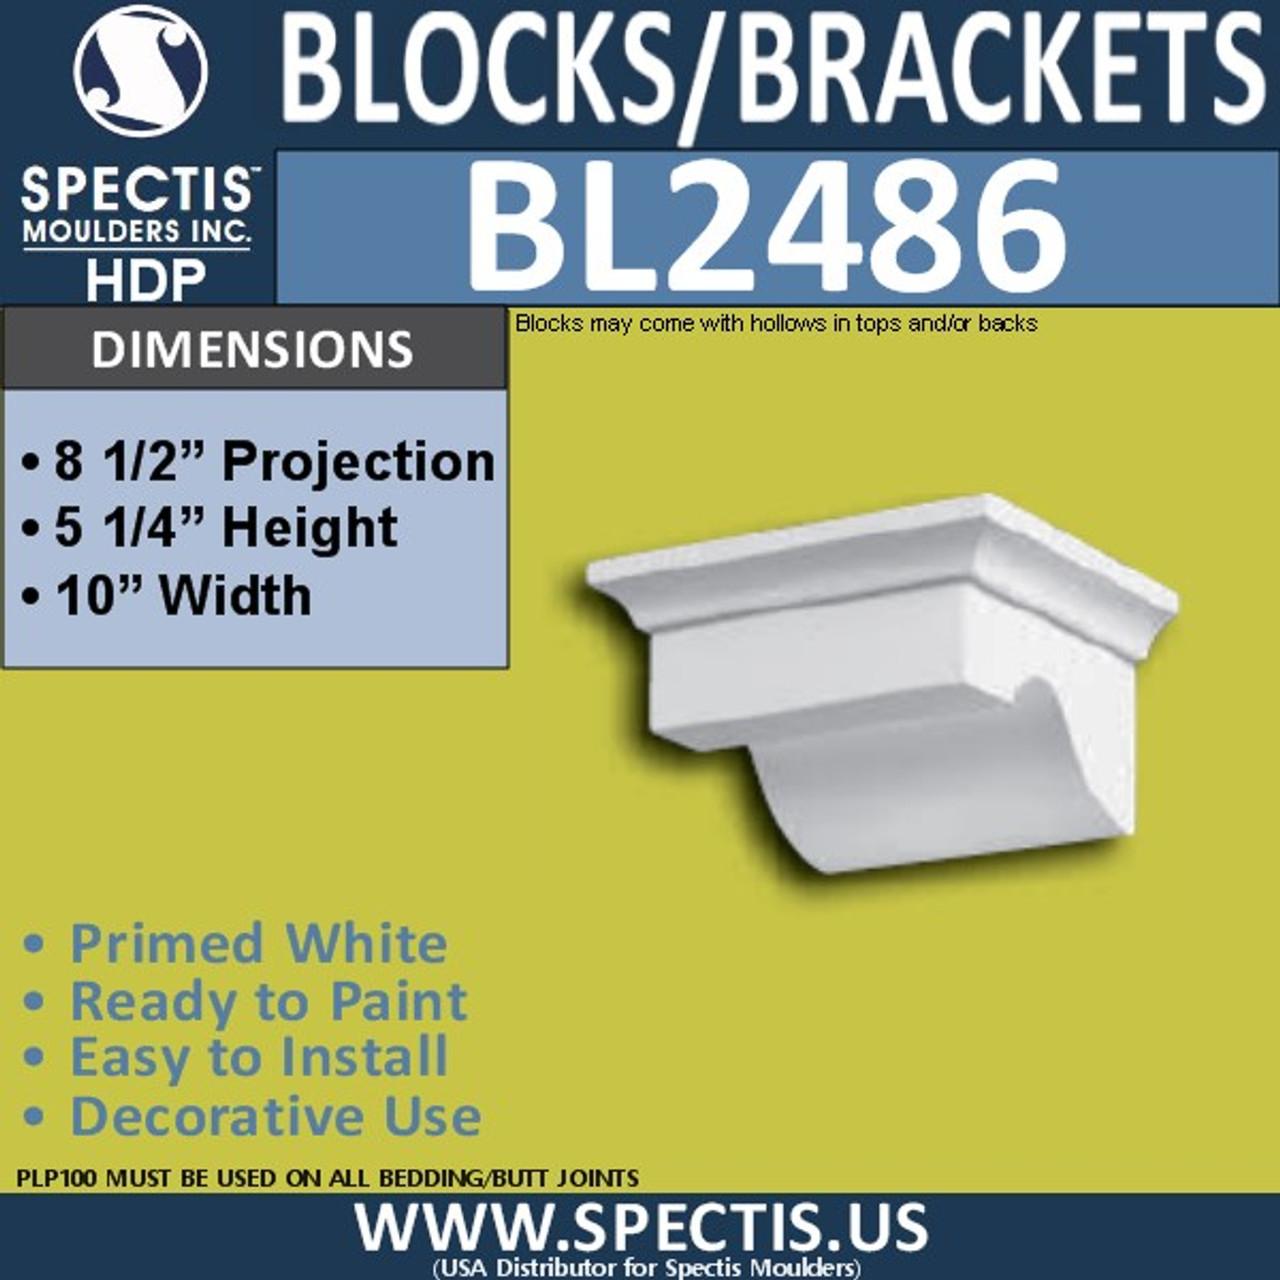 "BL2486 Eave Block or Bracket 10""W x 5.25""H x 8.5"" P"